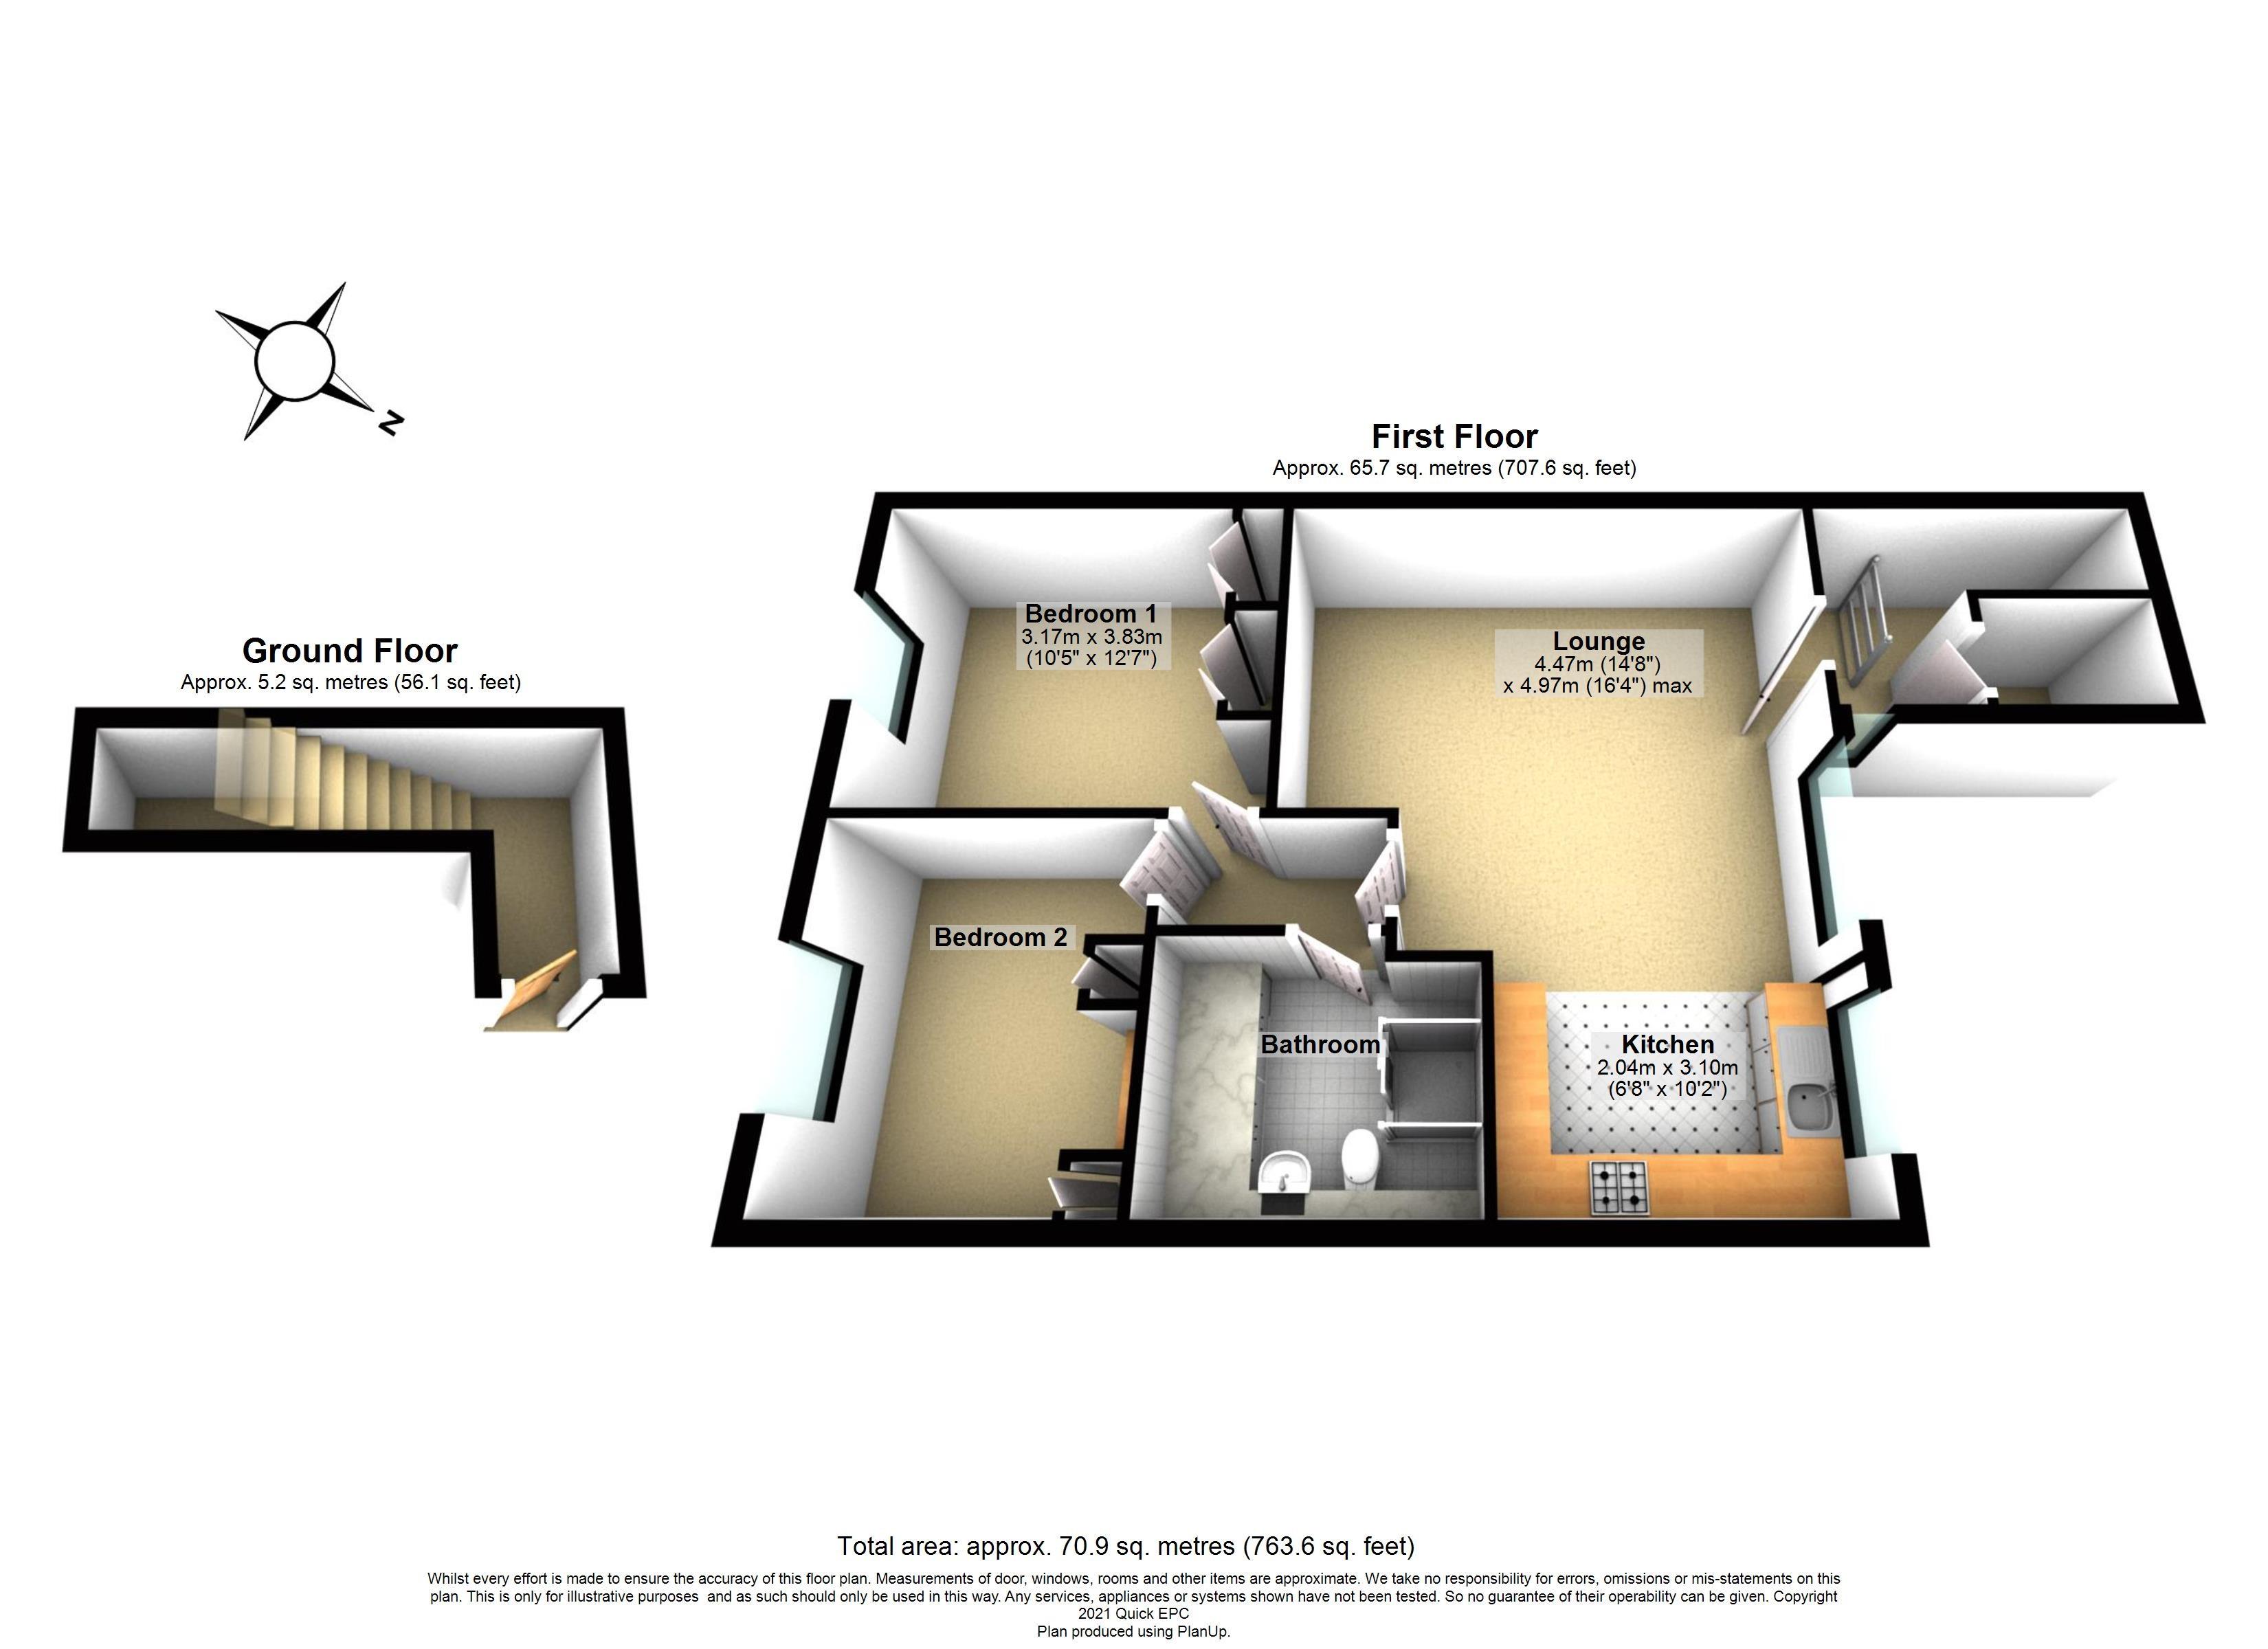 17 Ilford Court Floorplan